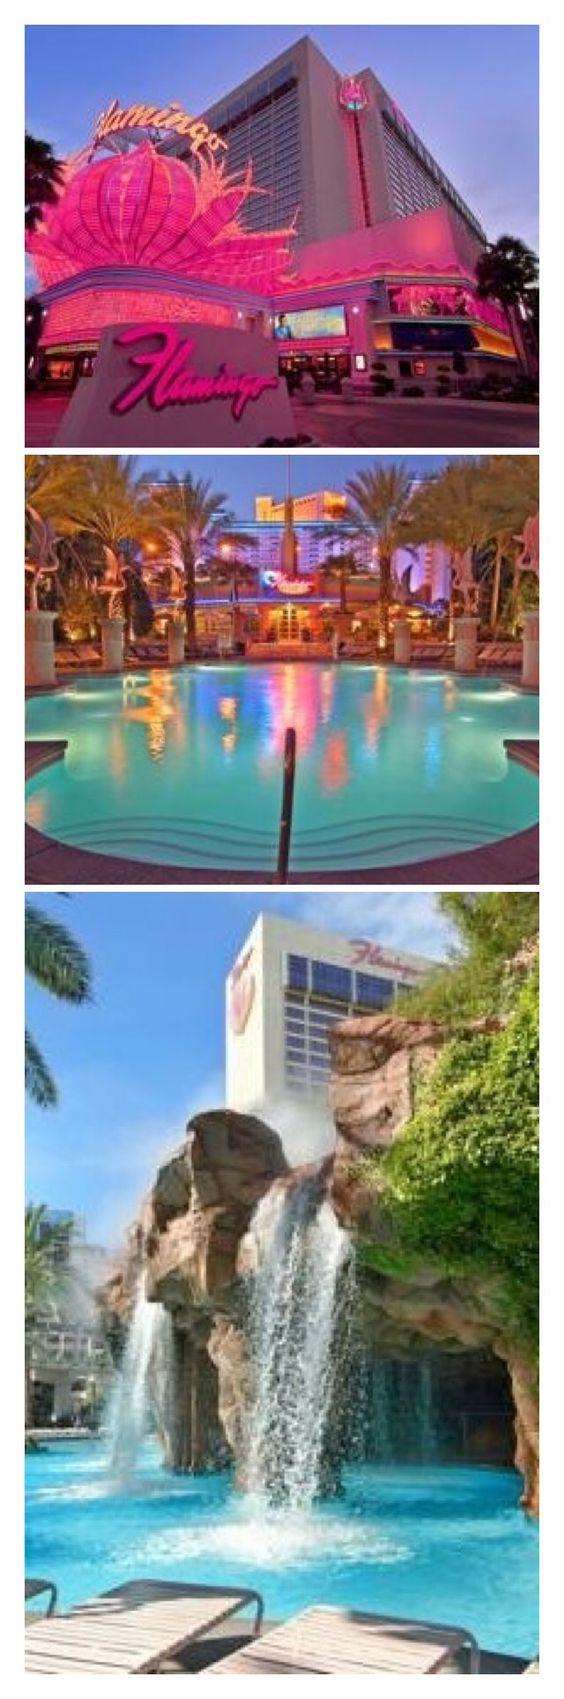 The Flamingo Hotel - Las Vegas Strip  Nevada